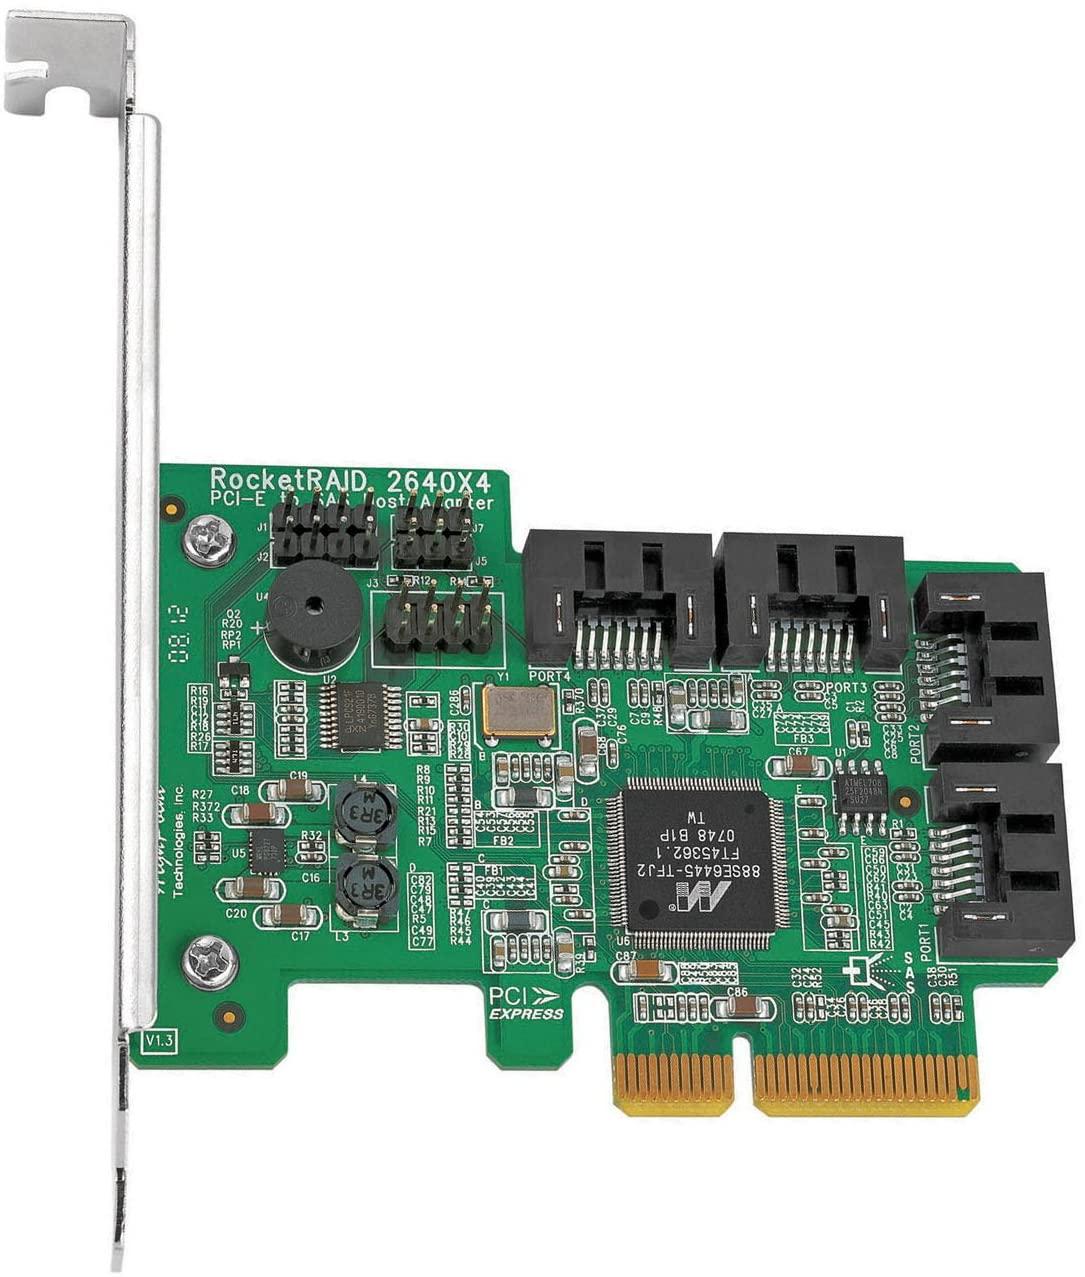 High Point RocketRAID 2640X4 4-Channel PCI-Express x4 SAS 3Gb/s RAIDController